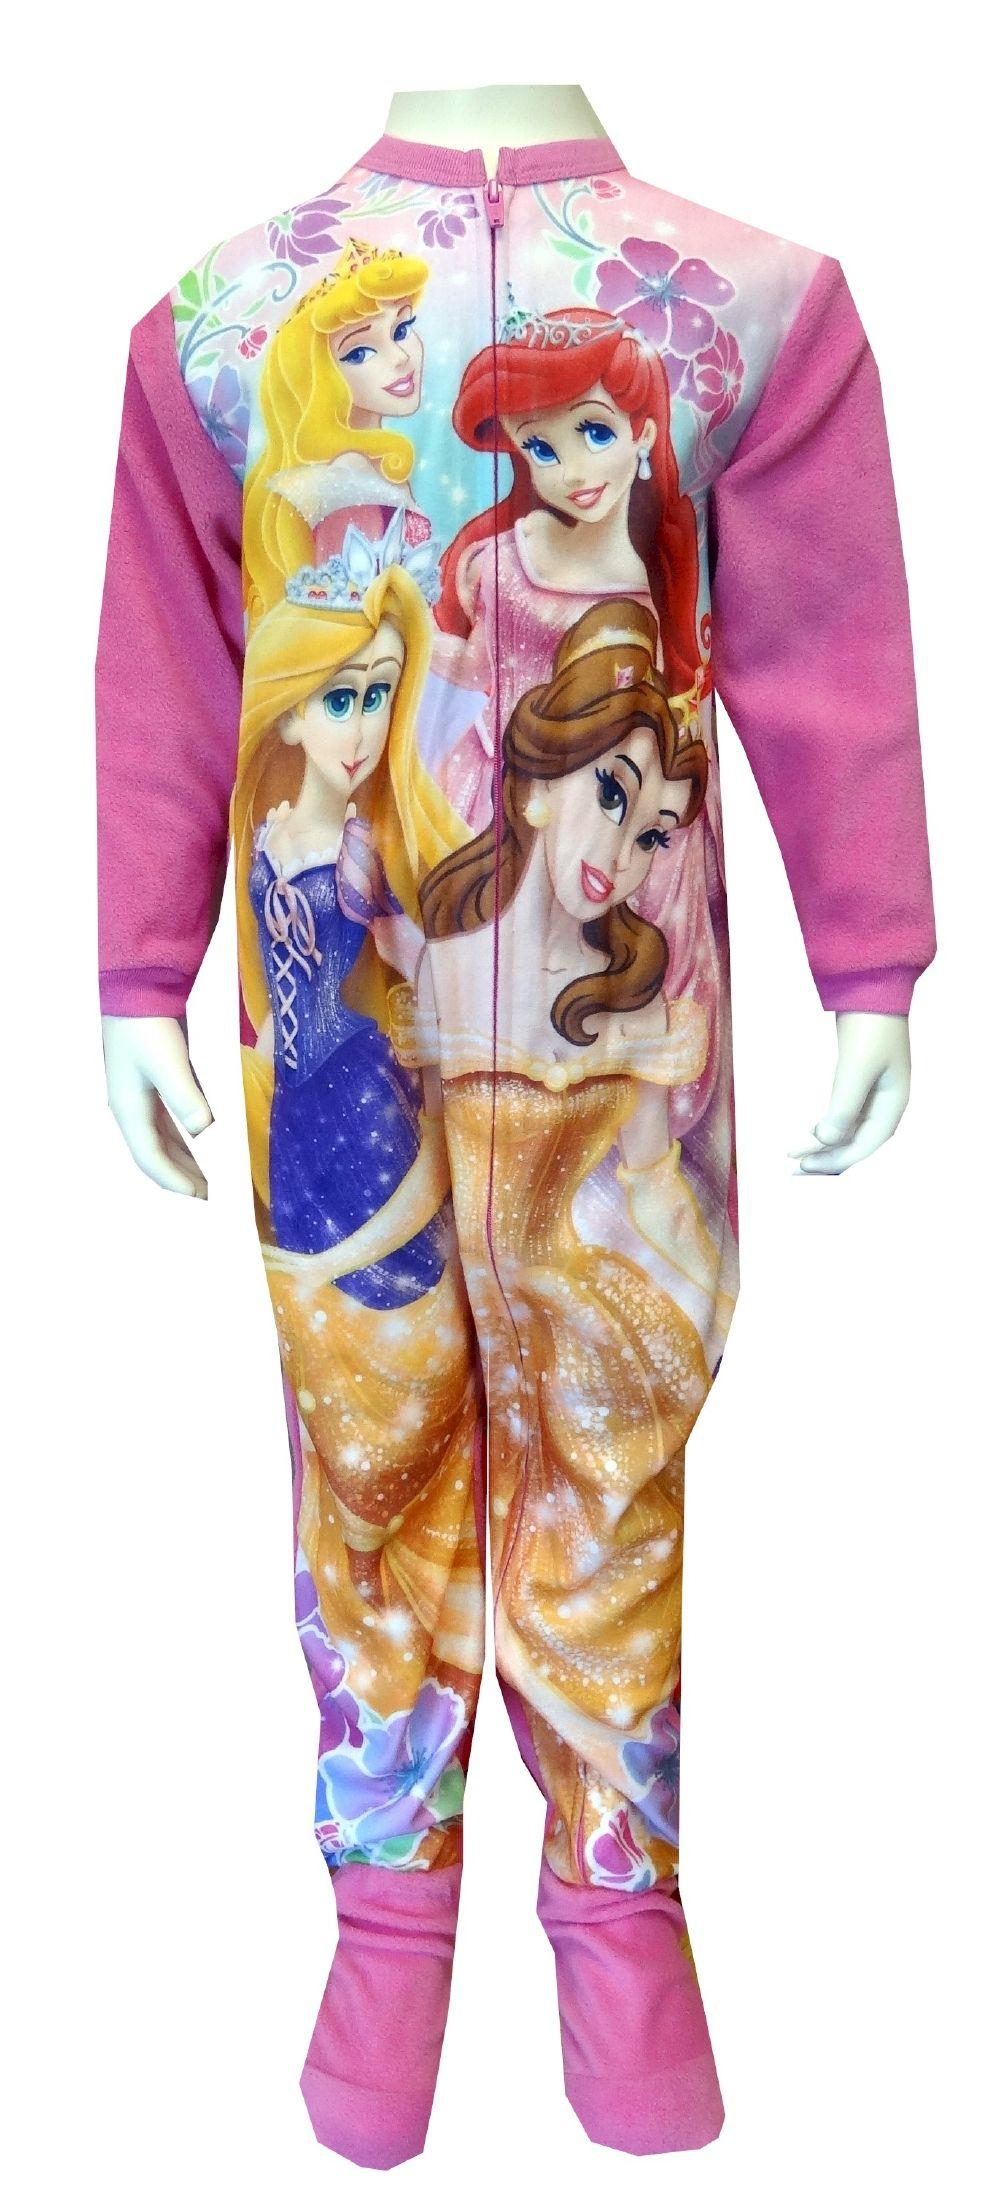 Disney Princess Toddler Onesie Footie Pajama Sleeper